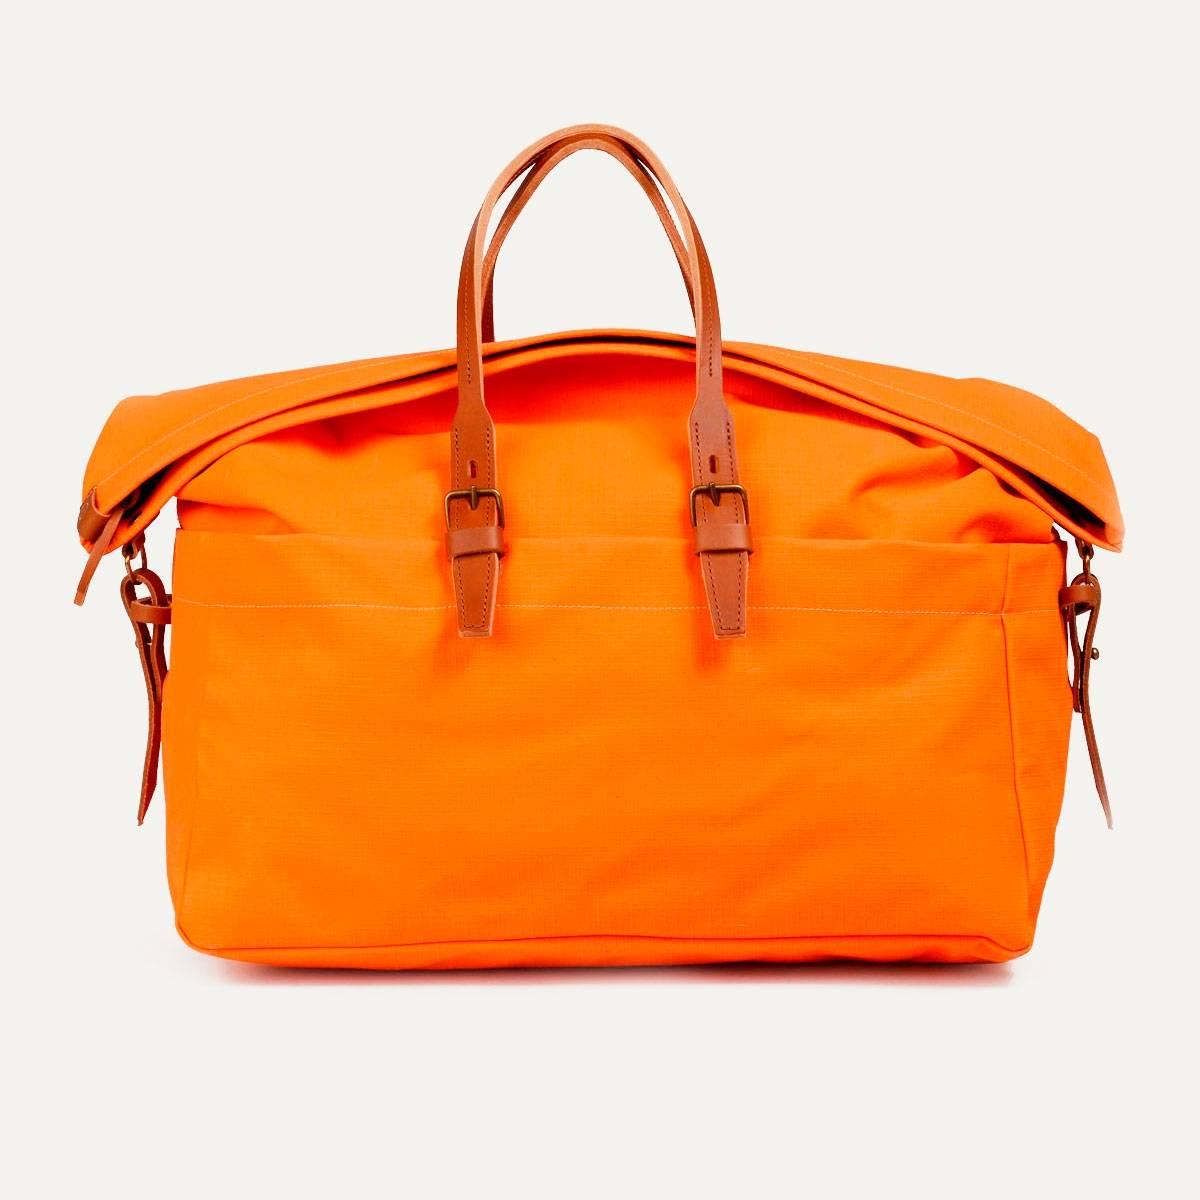 Cabine Travel bag - Regentex orange (image n°1)